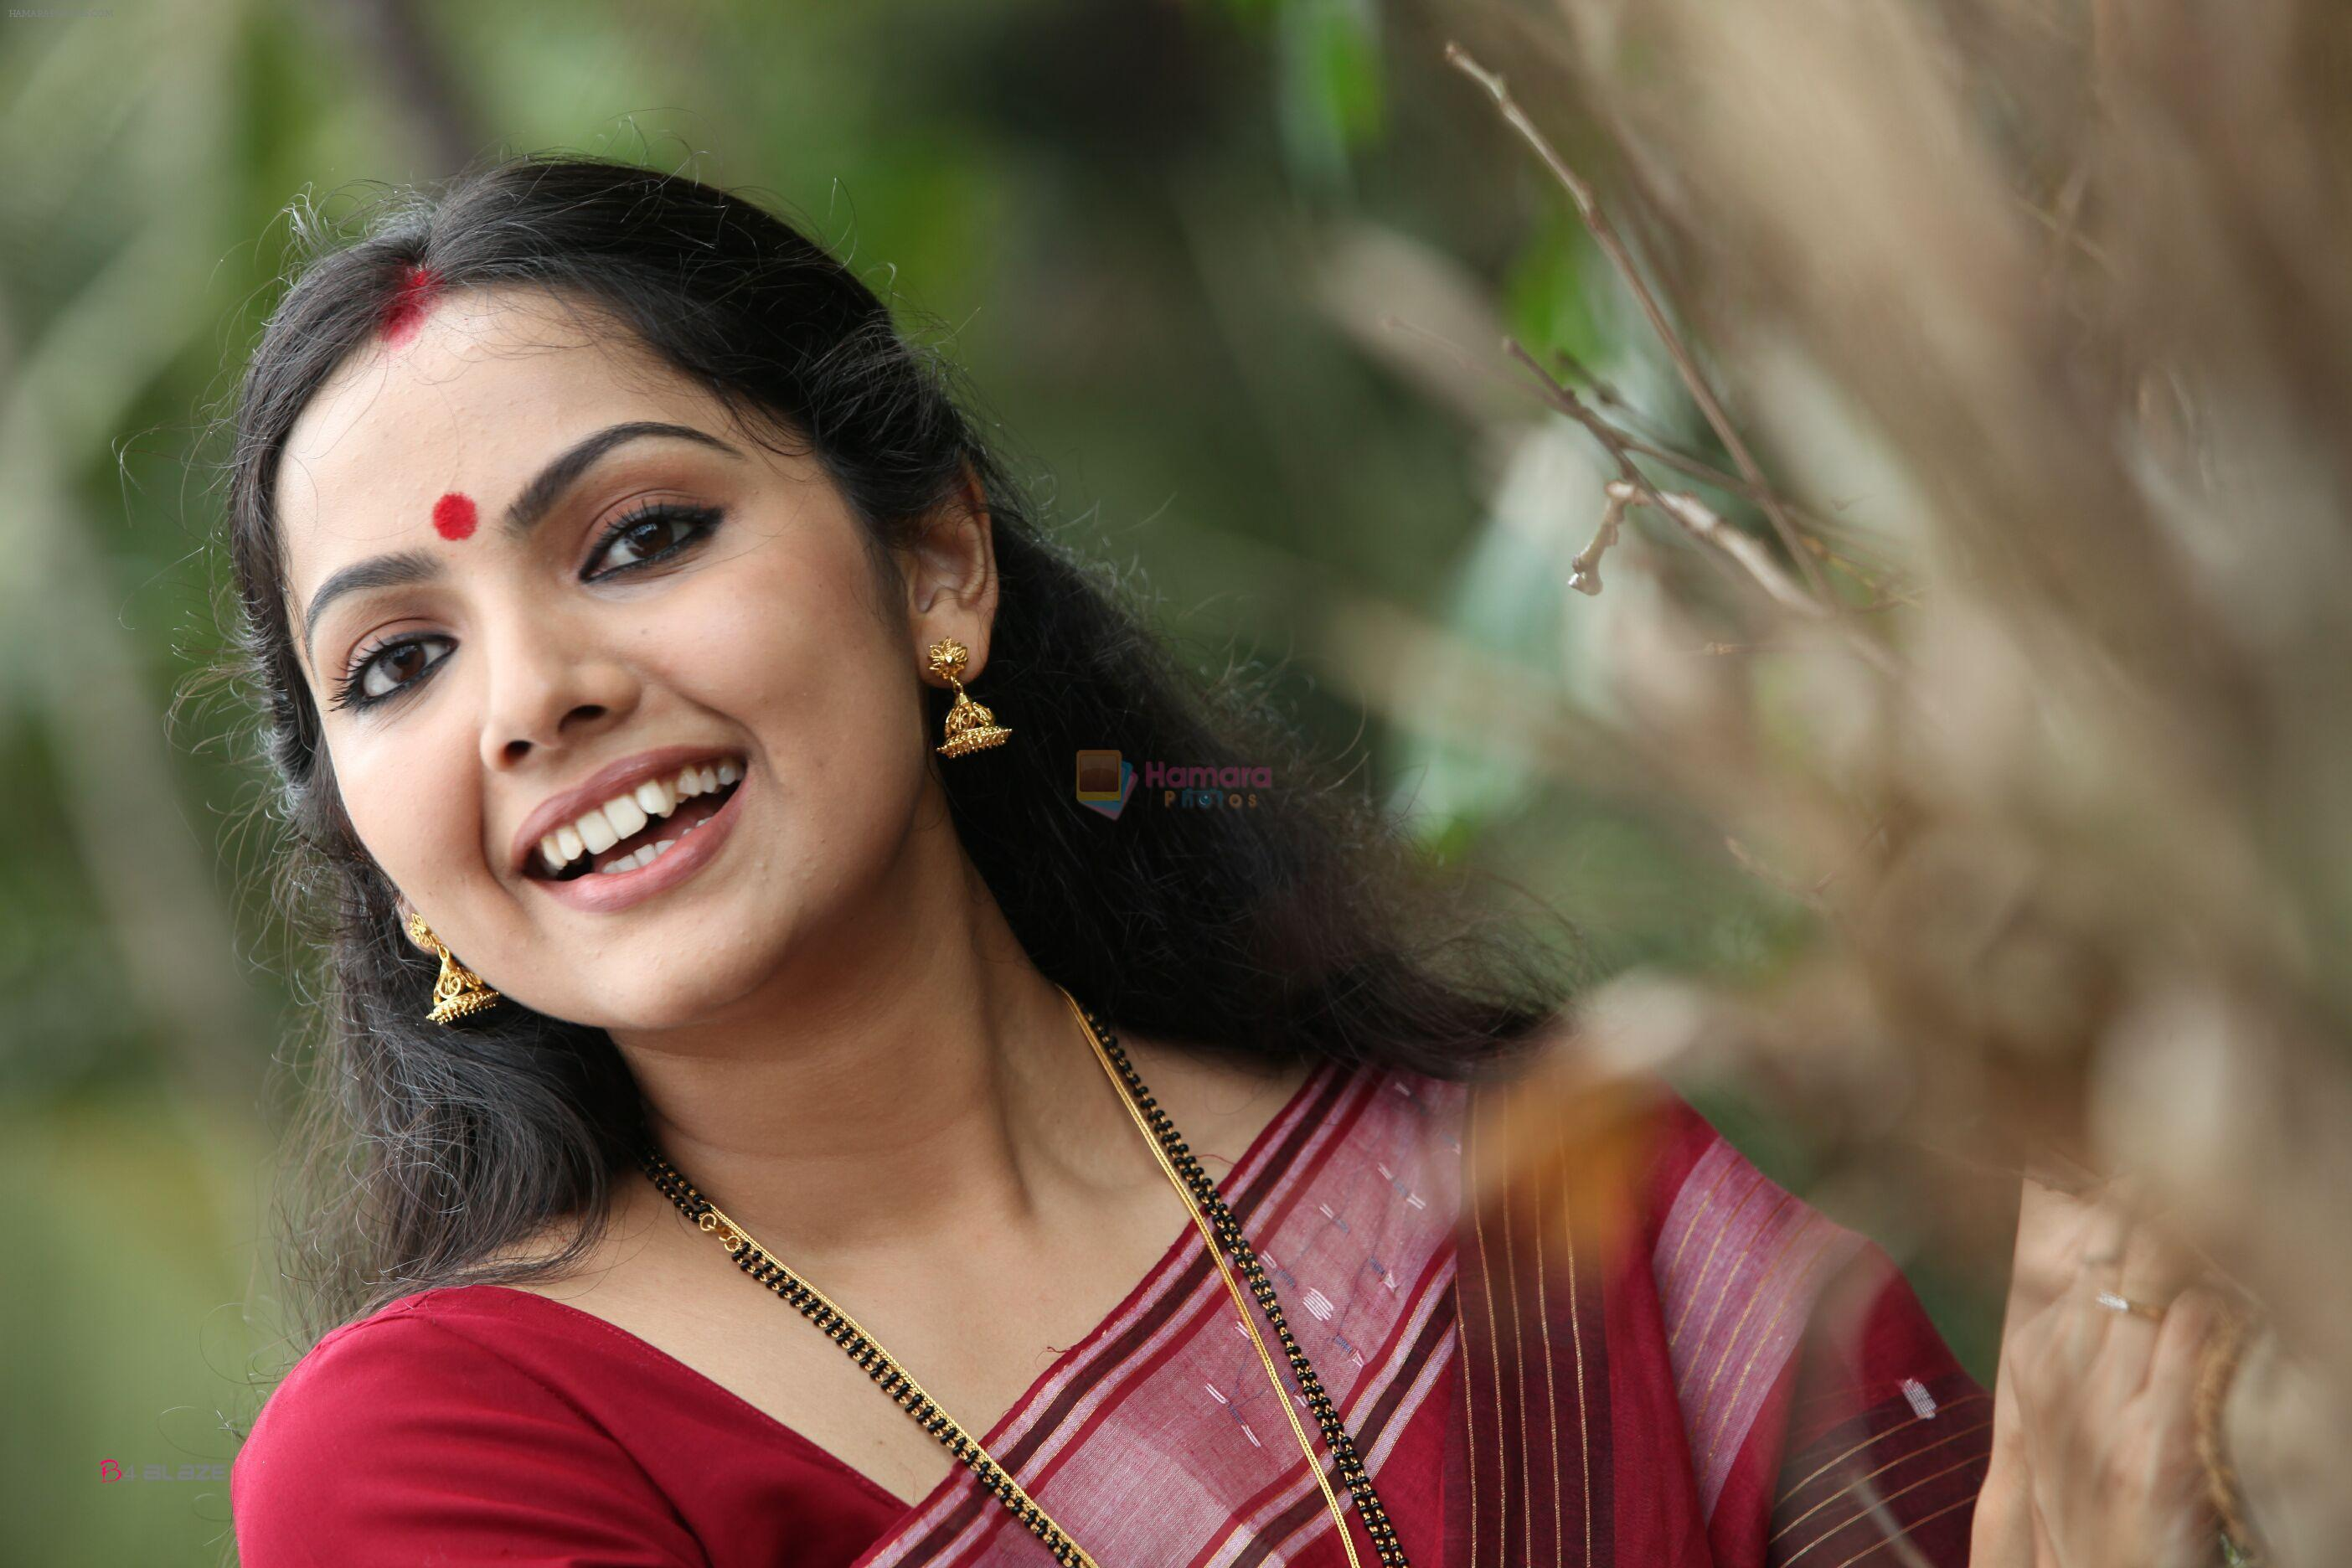 amvrutha Sunil in Swapna Sanchari Movie Stills shown to user